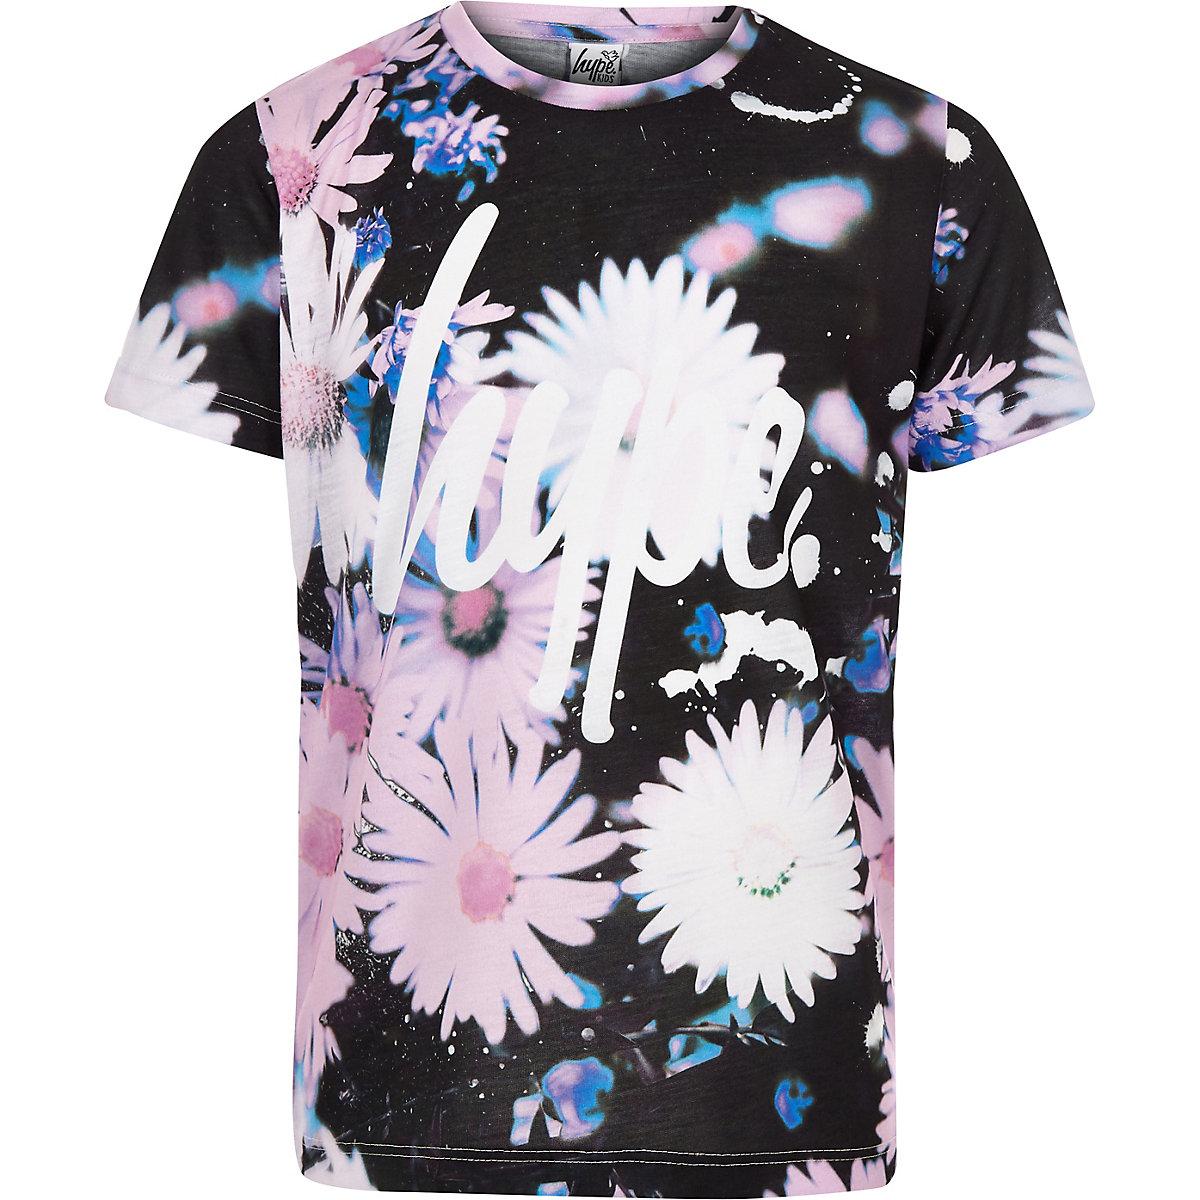 Girls Hype black daisy print T-shirt